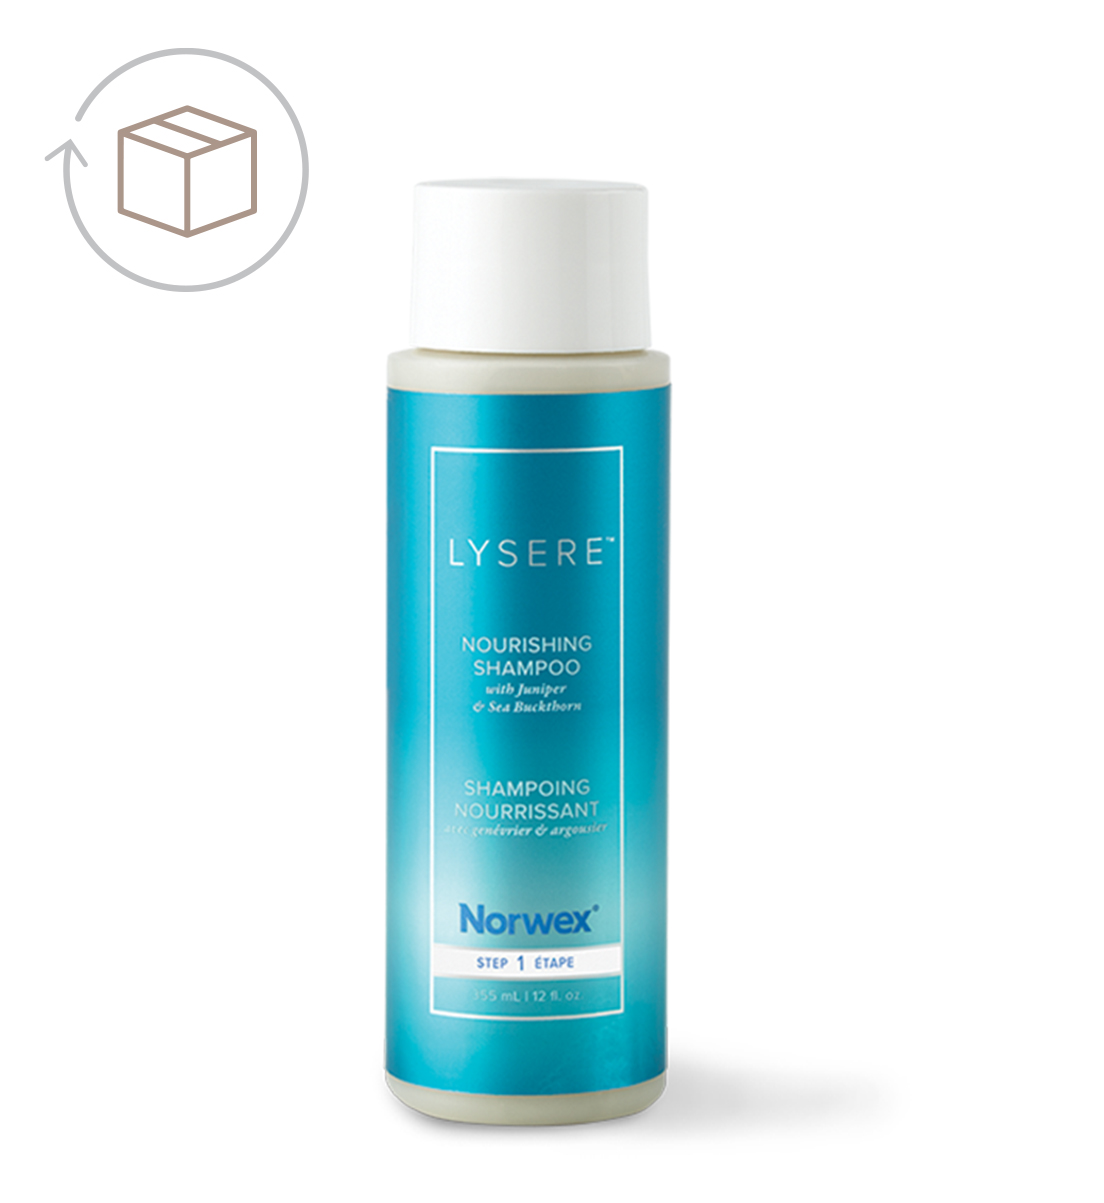 Lysere Nourishing Shampoo